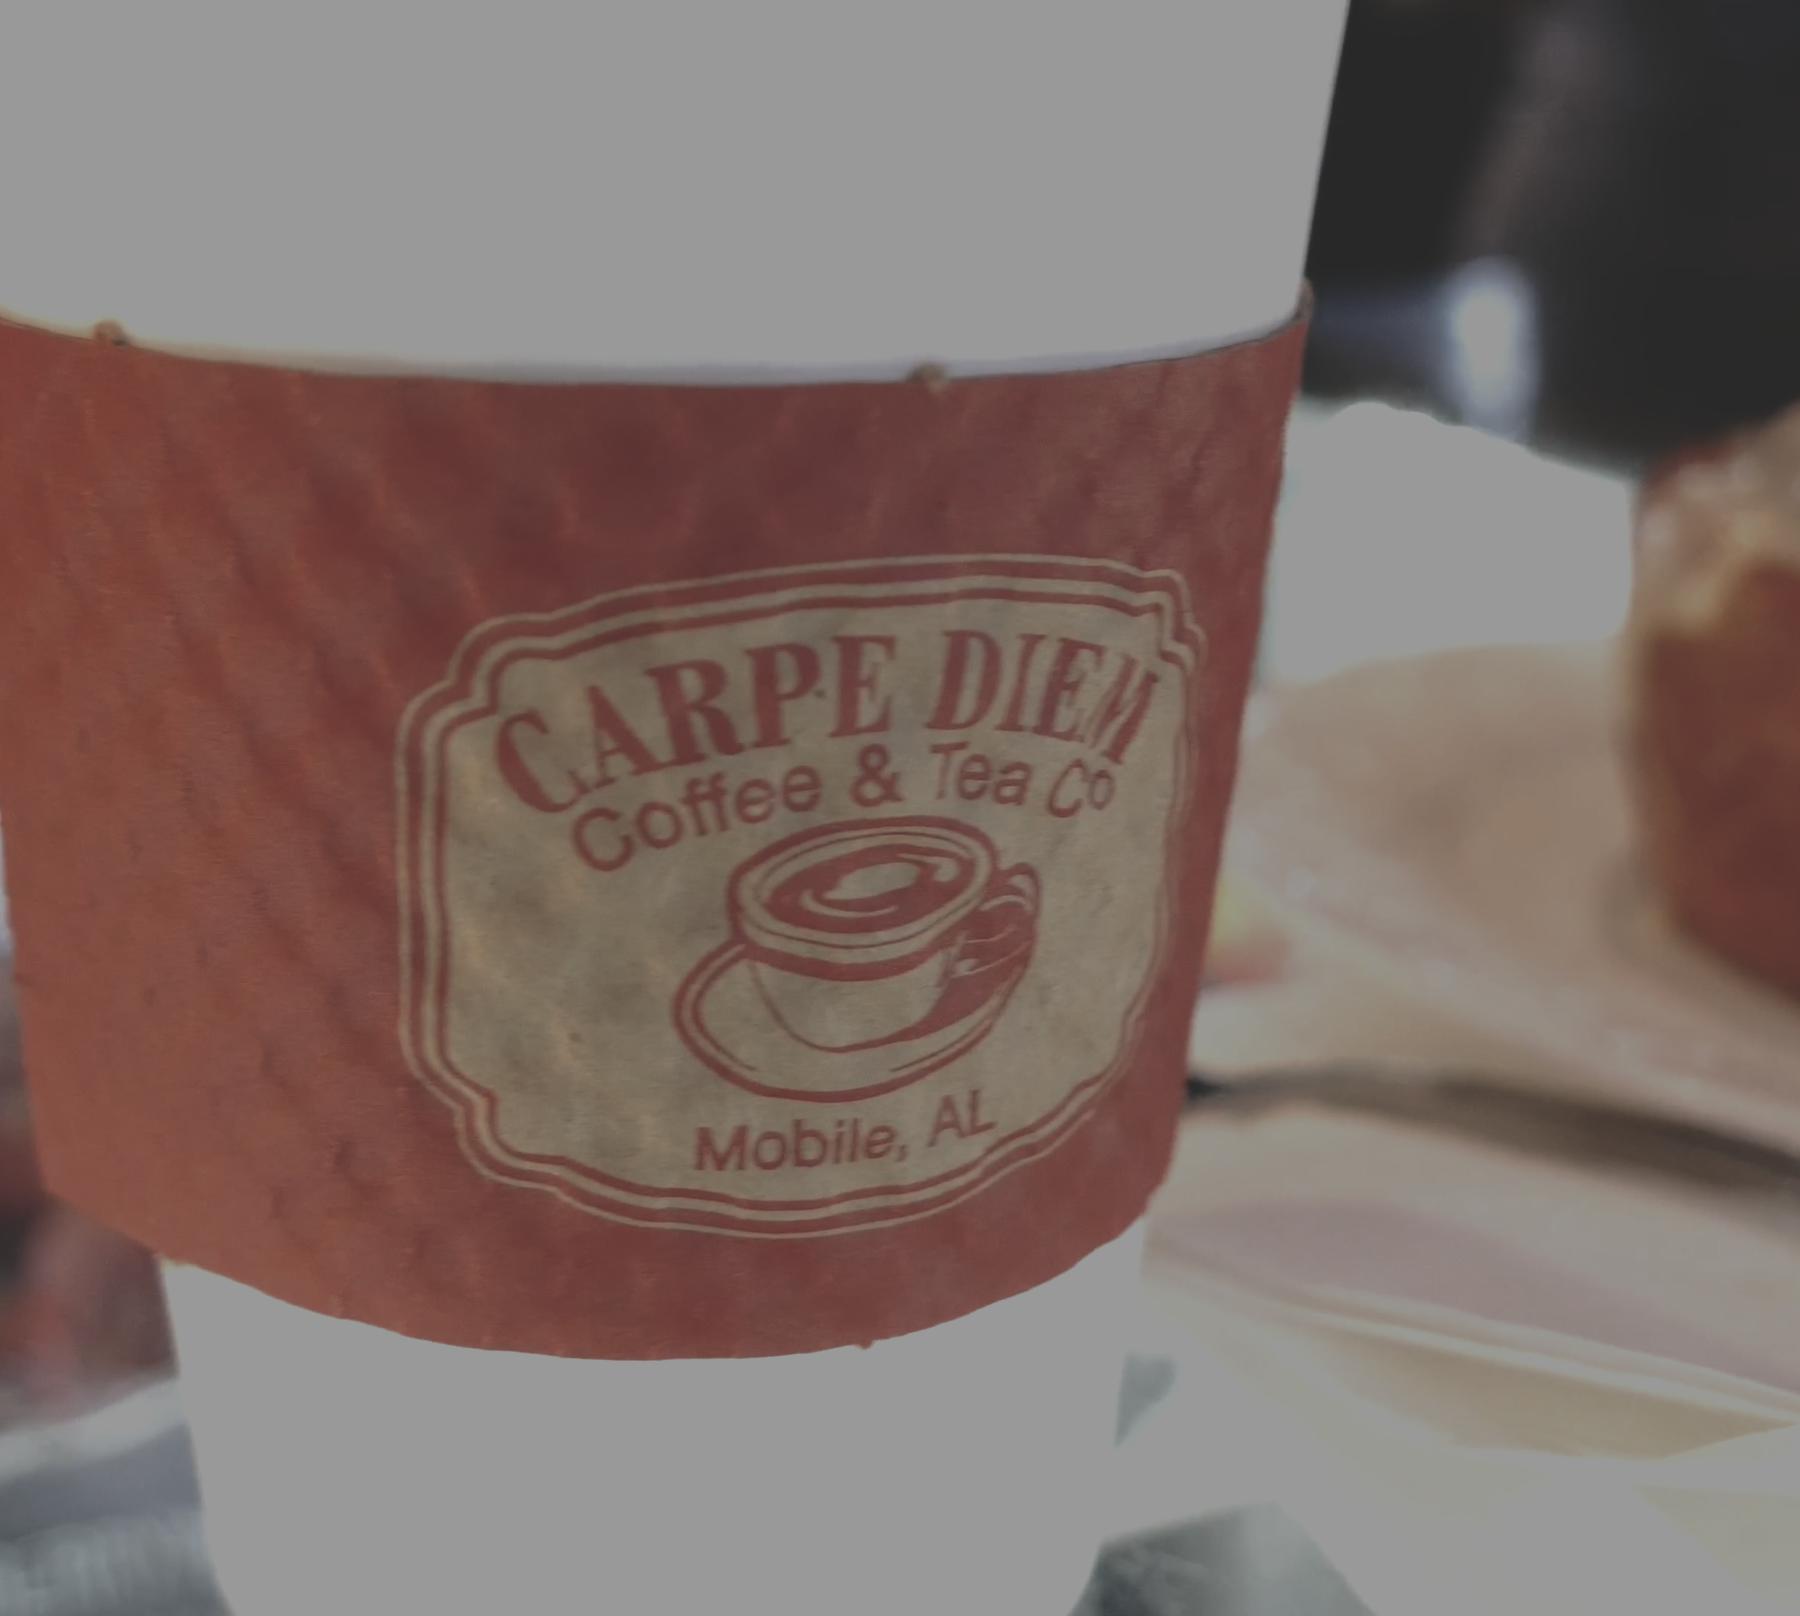 Carpe Diem Coffee Tea Co